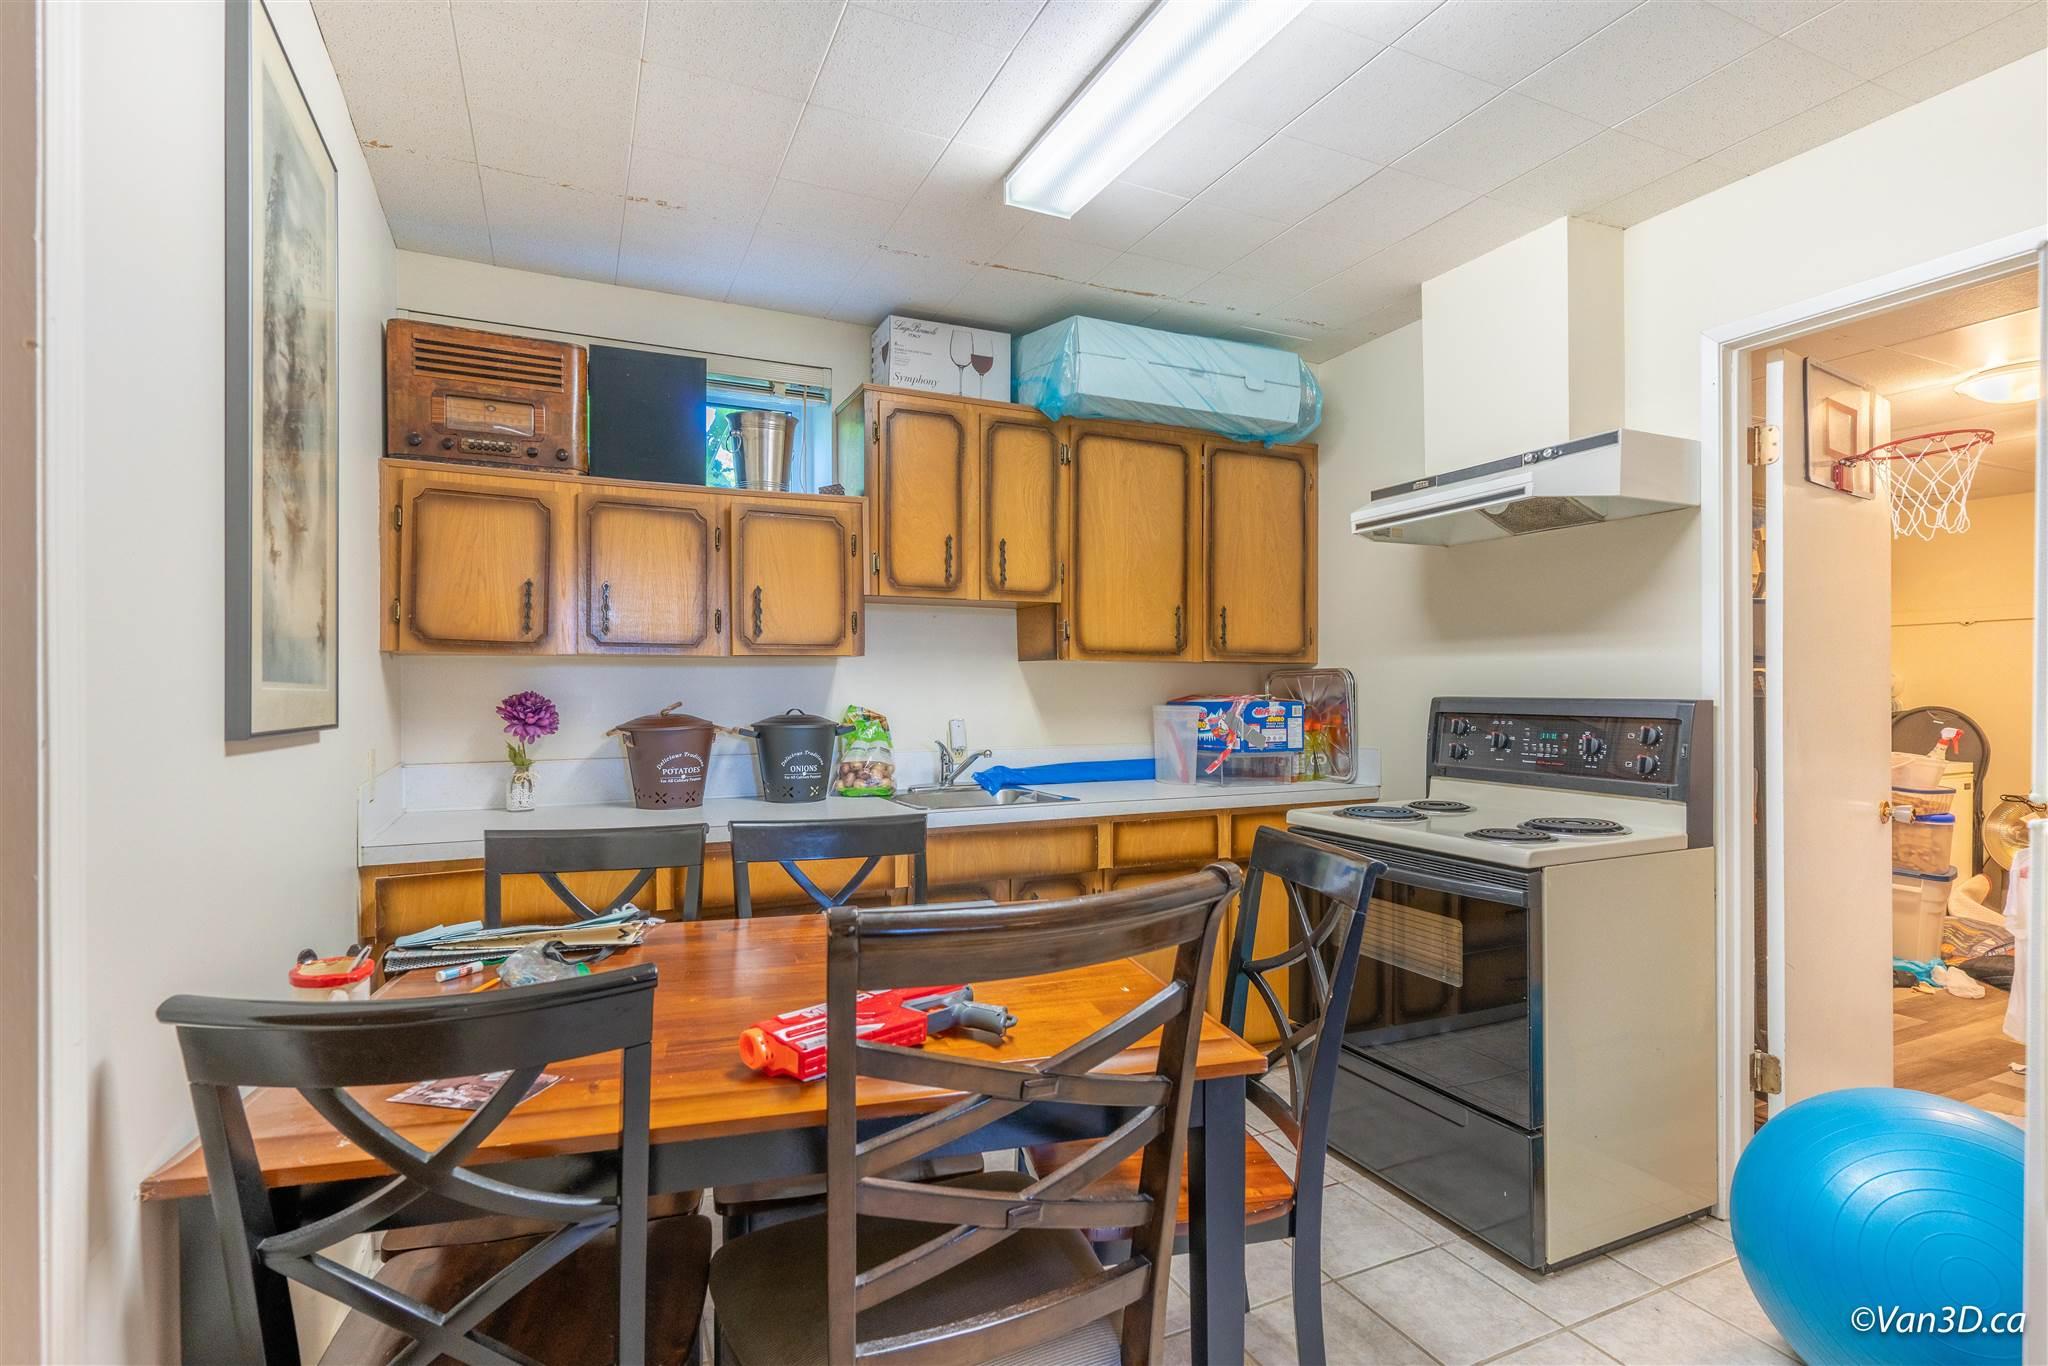 14495 MANN PARK CRESCENT - White Rock House/Single Family for sale, 4 Bedrooms (R2604561) - #36